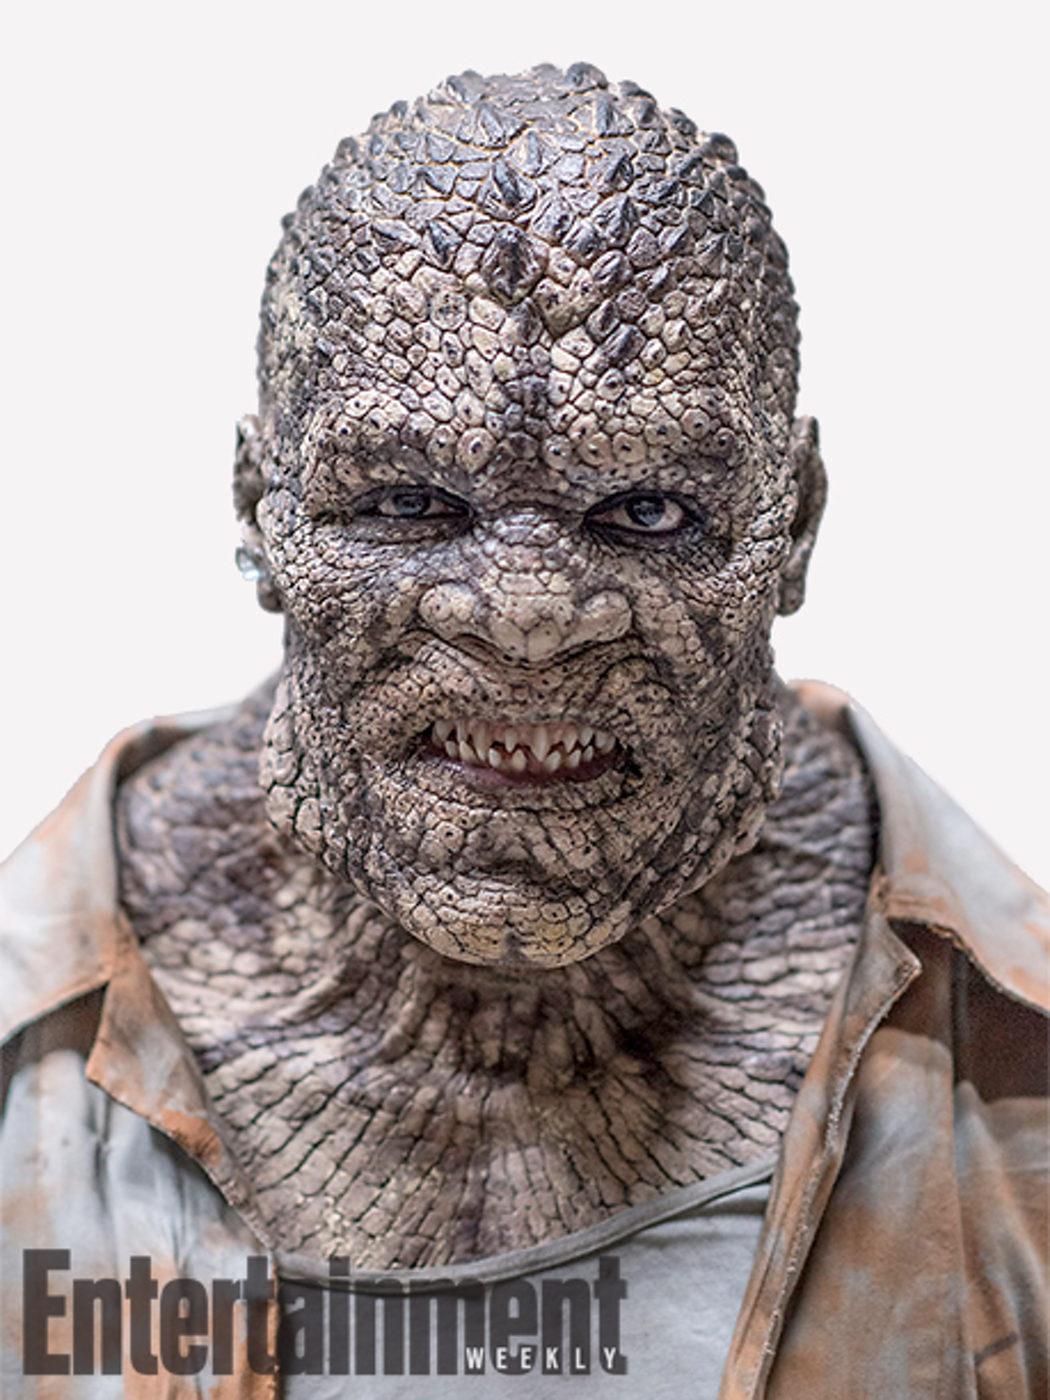 Adewale Akinnuoye-Agbaje como Killer Croc